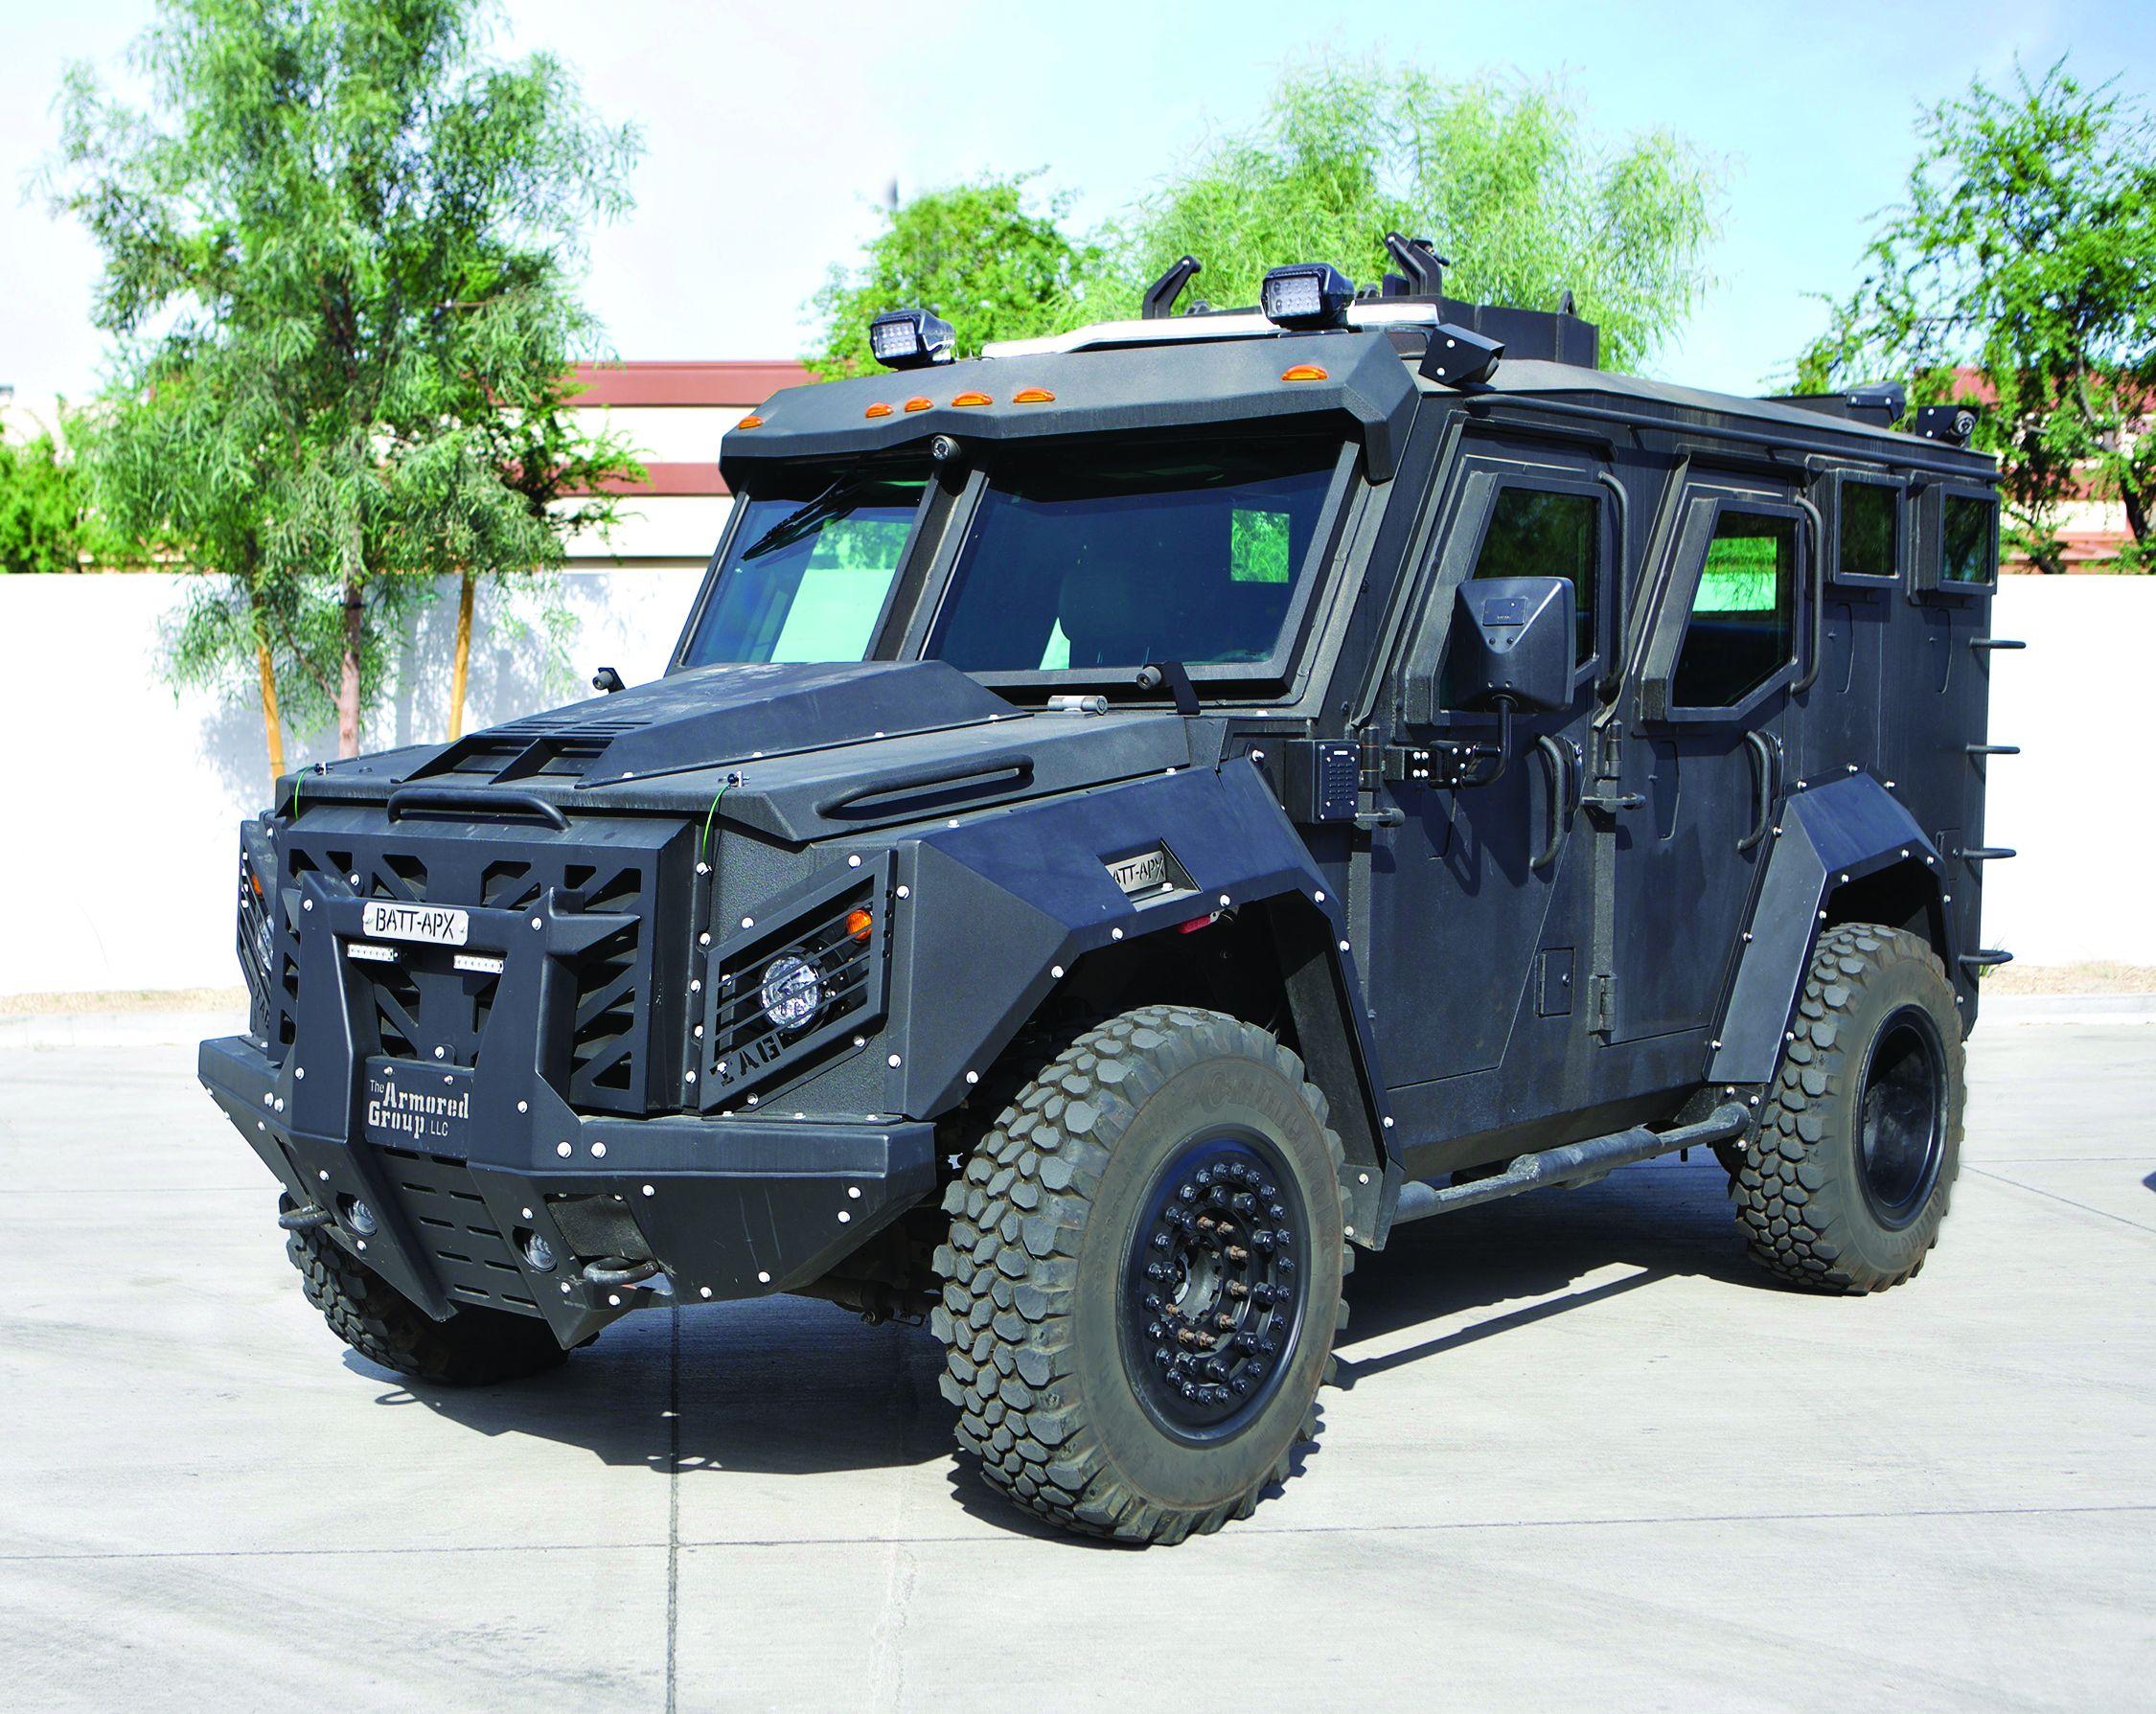 Vehicle Spotlight: The Armored Group BATT-X and Discreet Armored Suburban